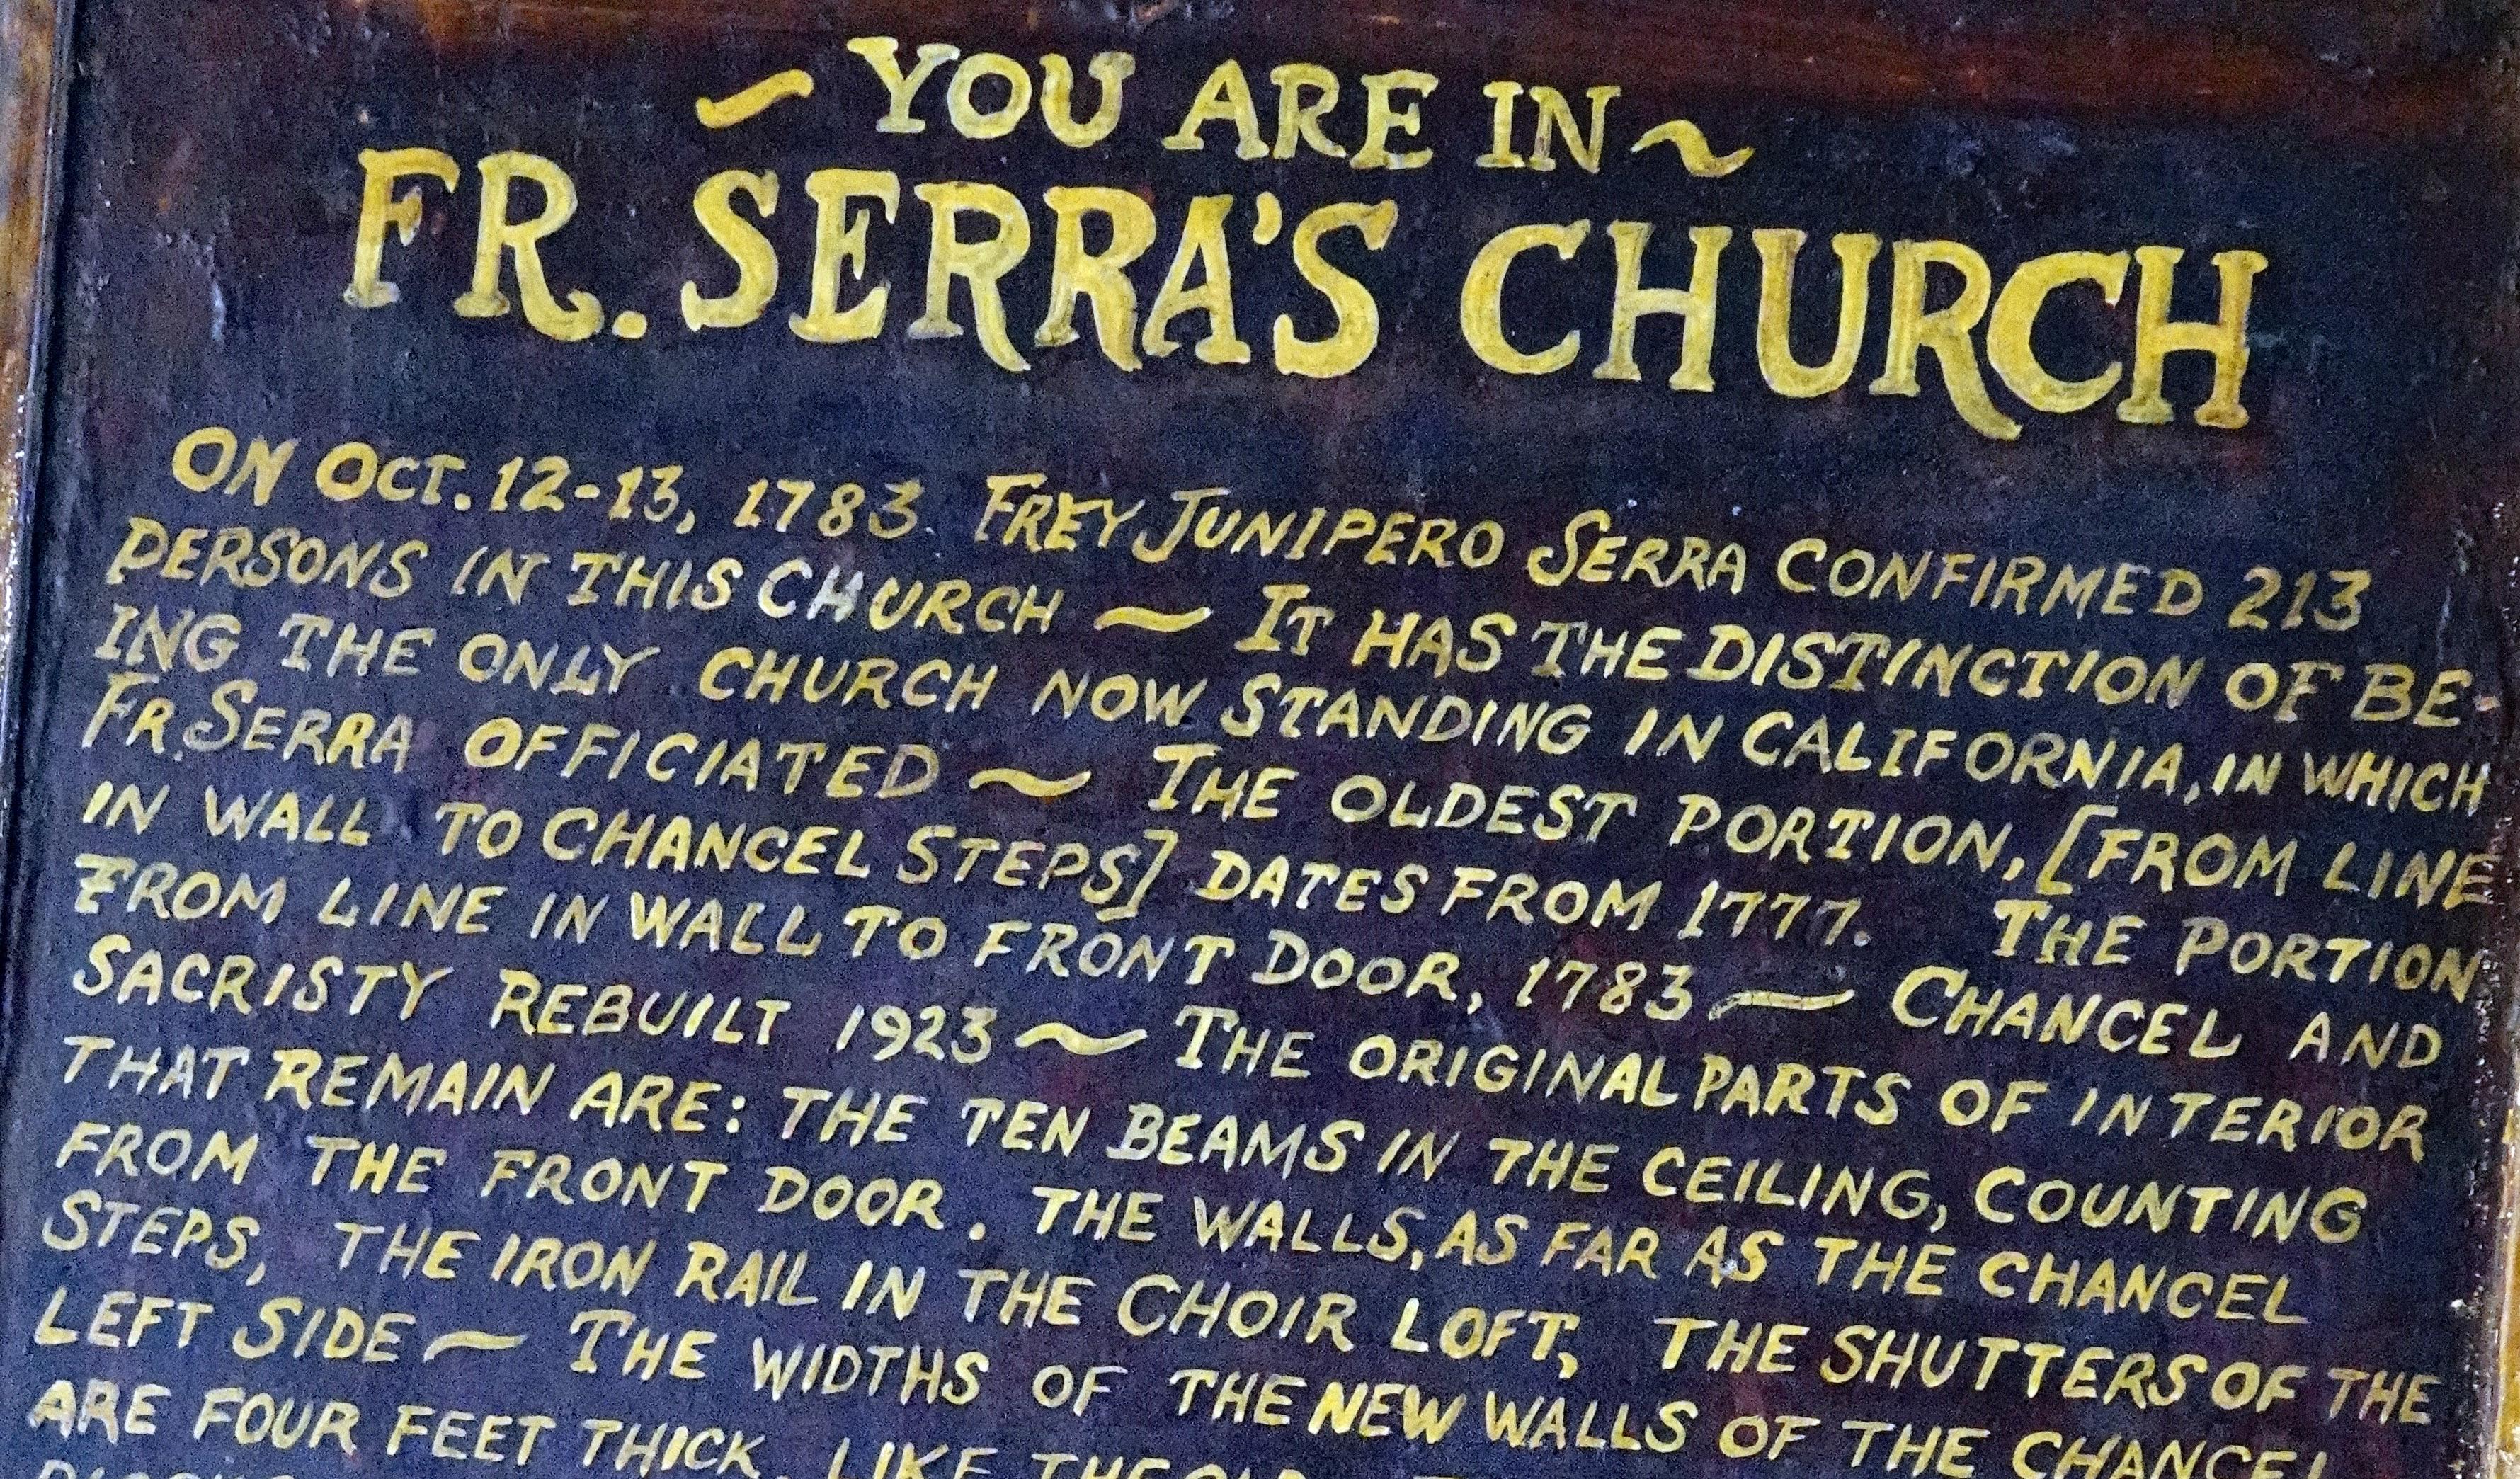 Mission San Juan Capistrano, which includes Serra Chapel, will mark its 250th anniversary in 2026. Photo: Fred Swegles